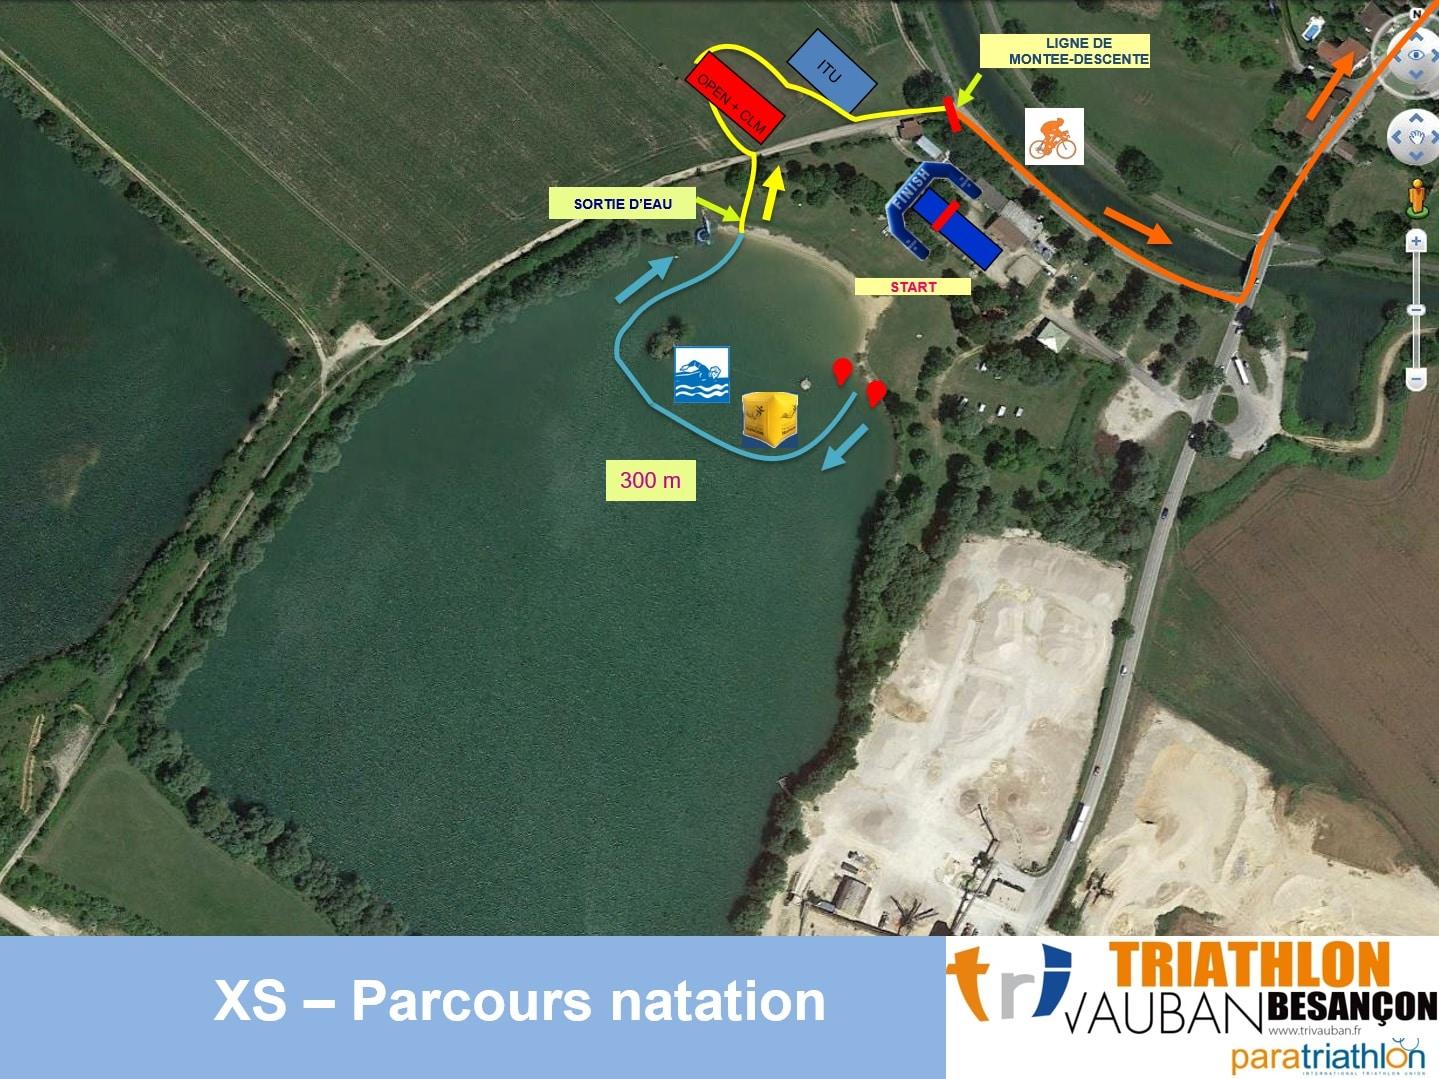 Parcours Natation Xs Triathlon Vauban